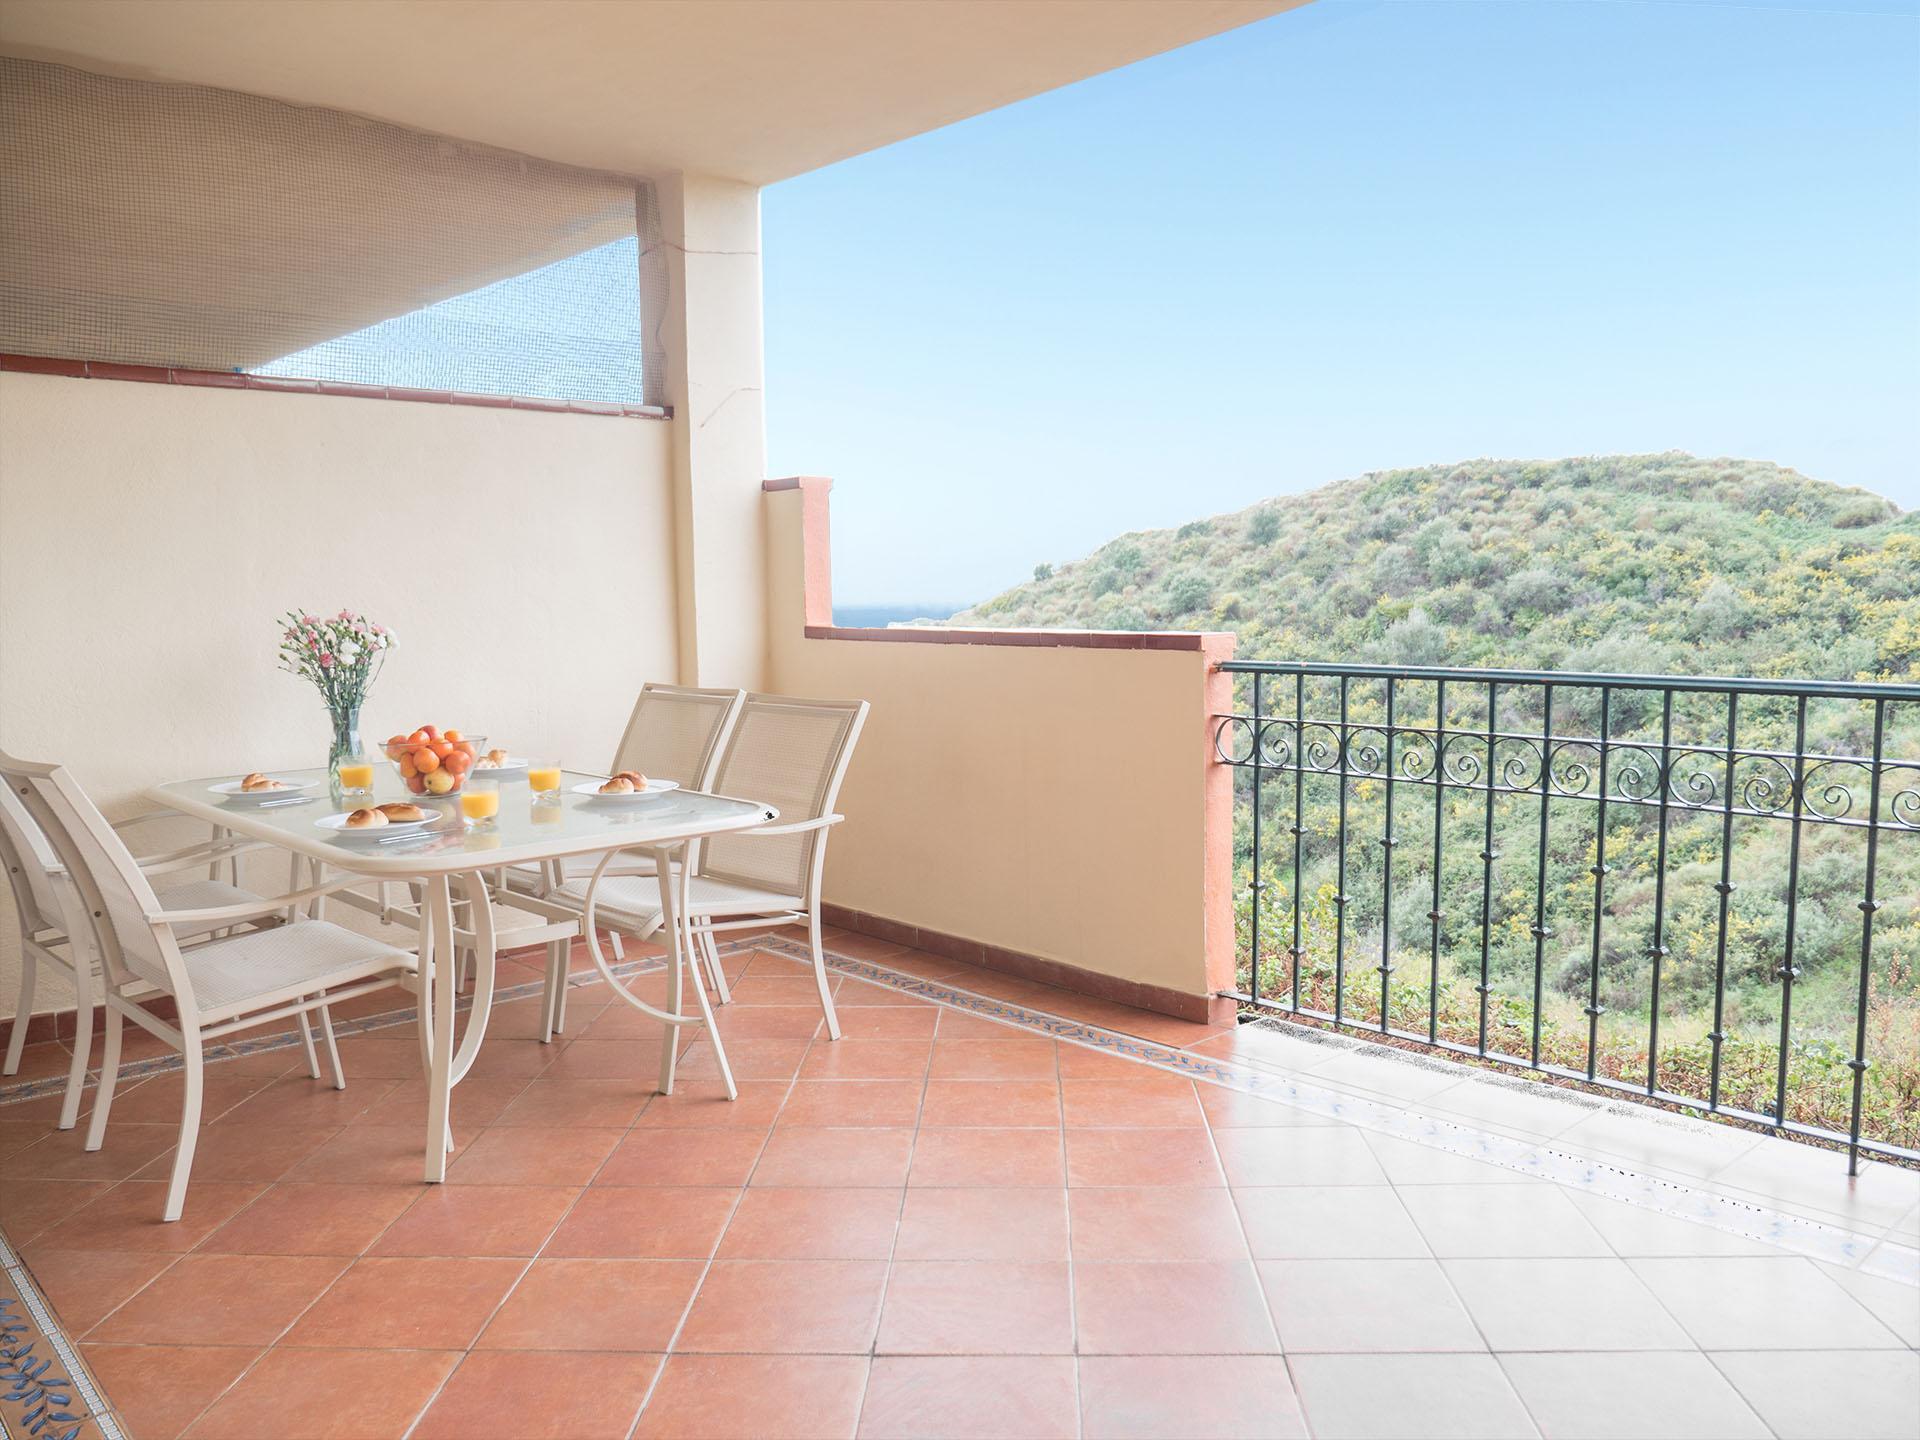 MalagaSuite Riviera Paradise photo 15418875